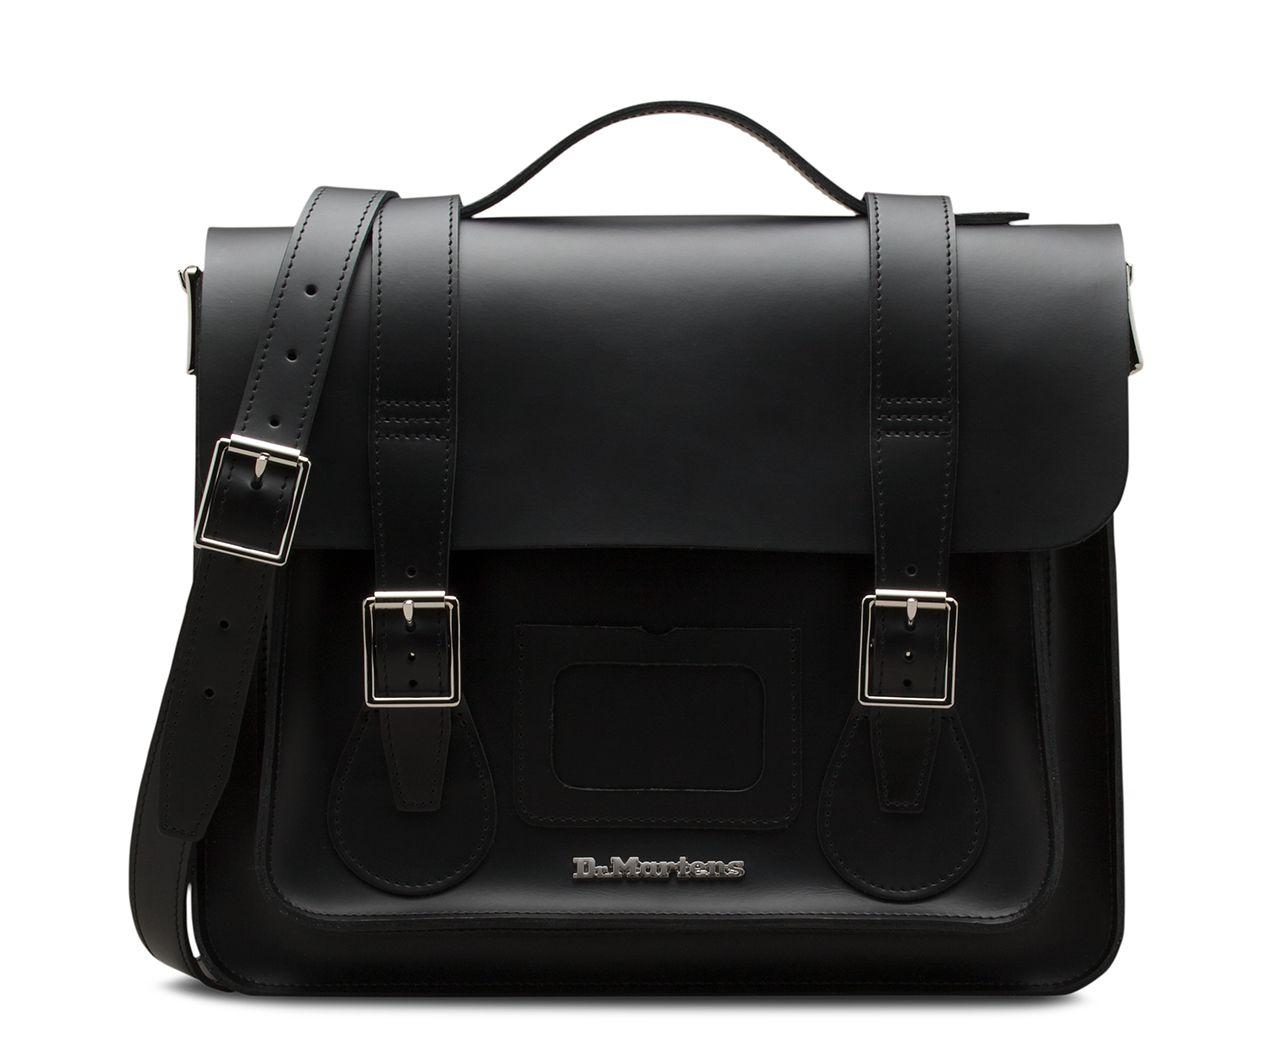 Sac à dos Dr. Martens Charro Brown Brando Large Backpack Dr. Martens pour homme